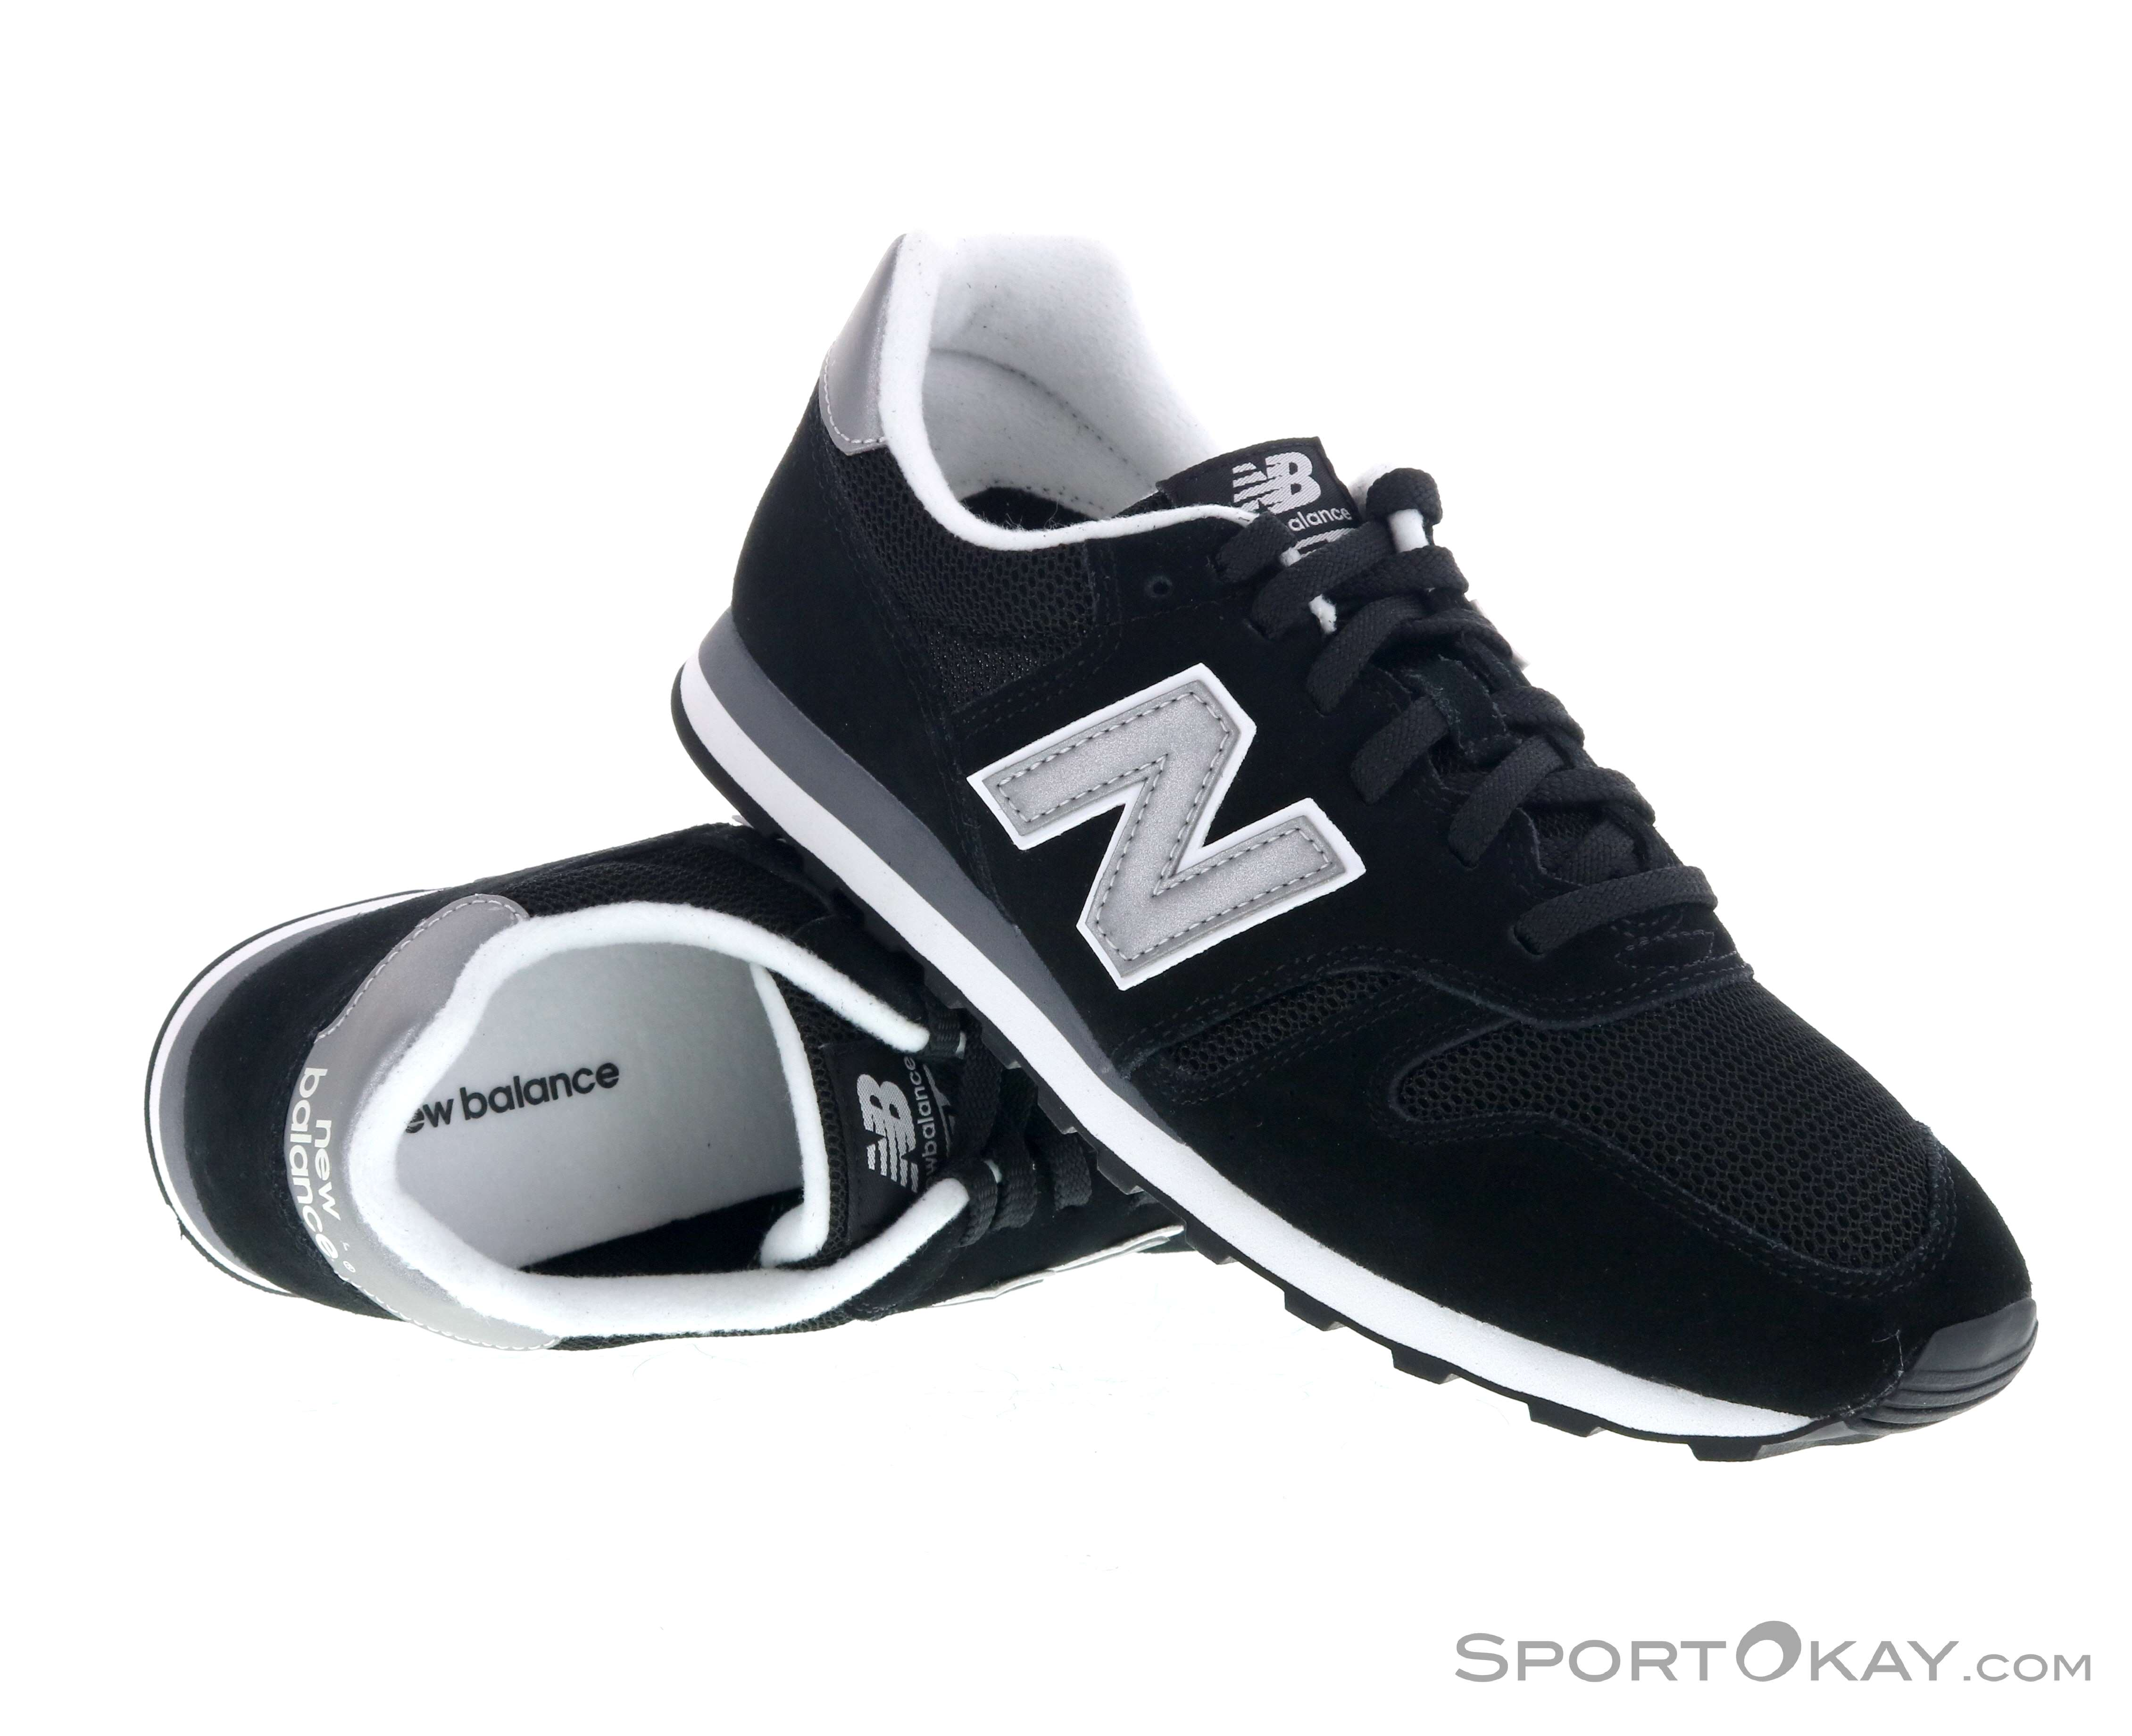 New Balance New Balance 373 Modern Classics Leisure Shoes